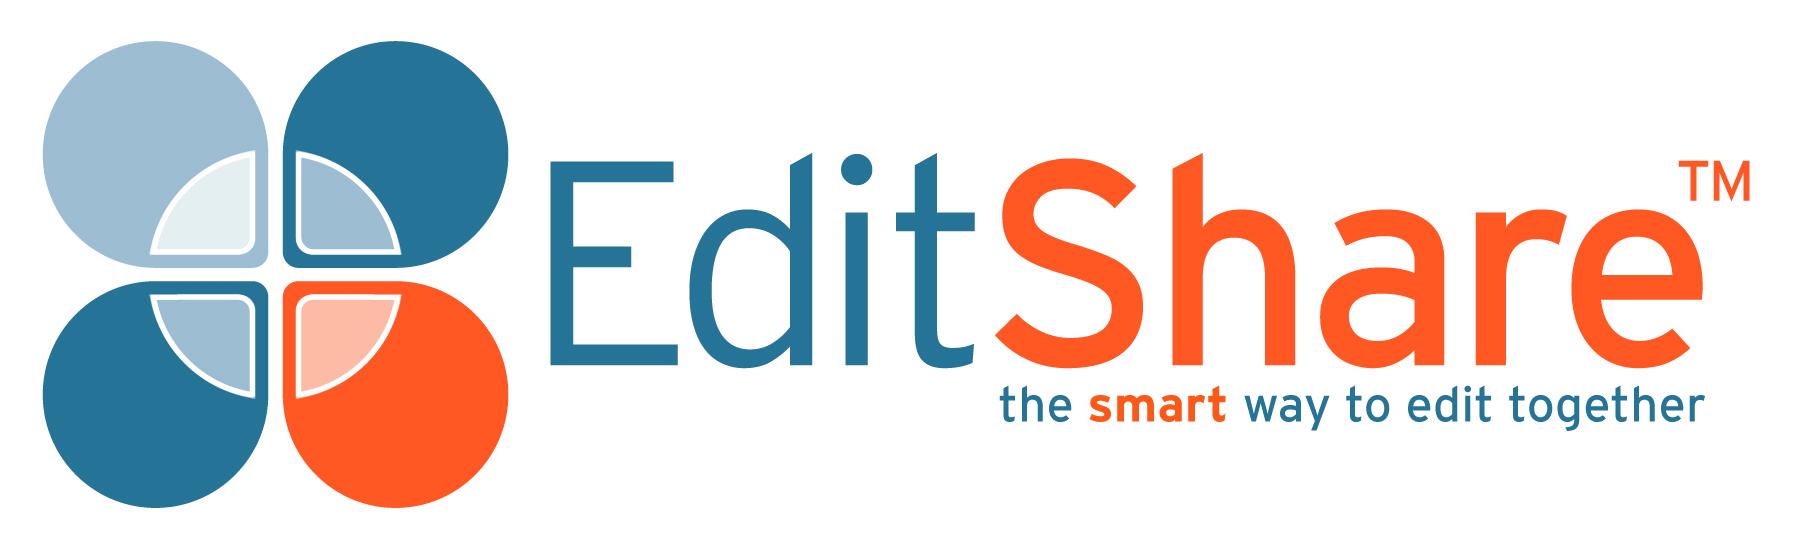 editshare-logo